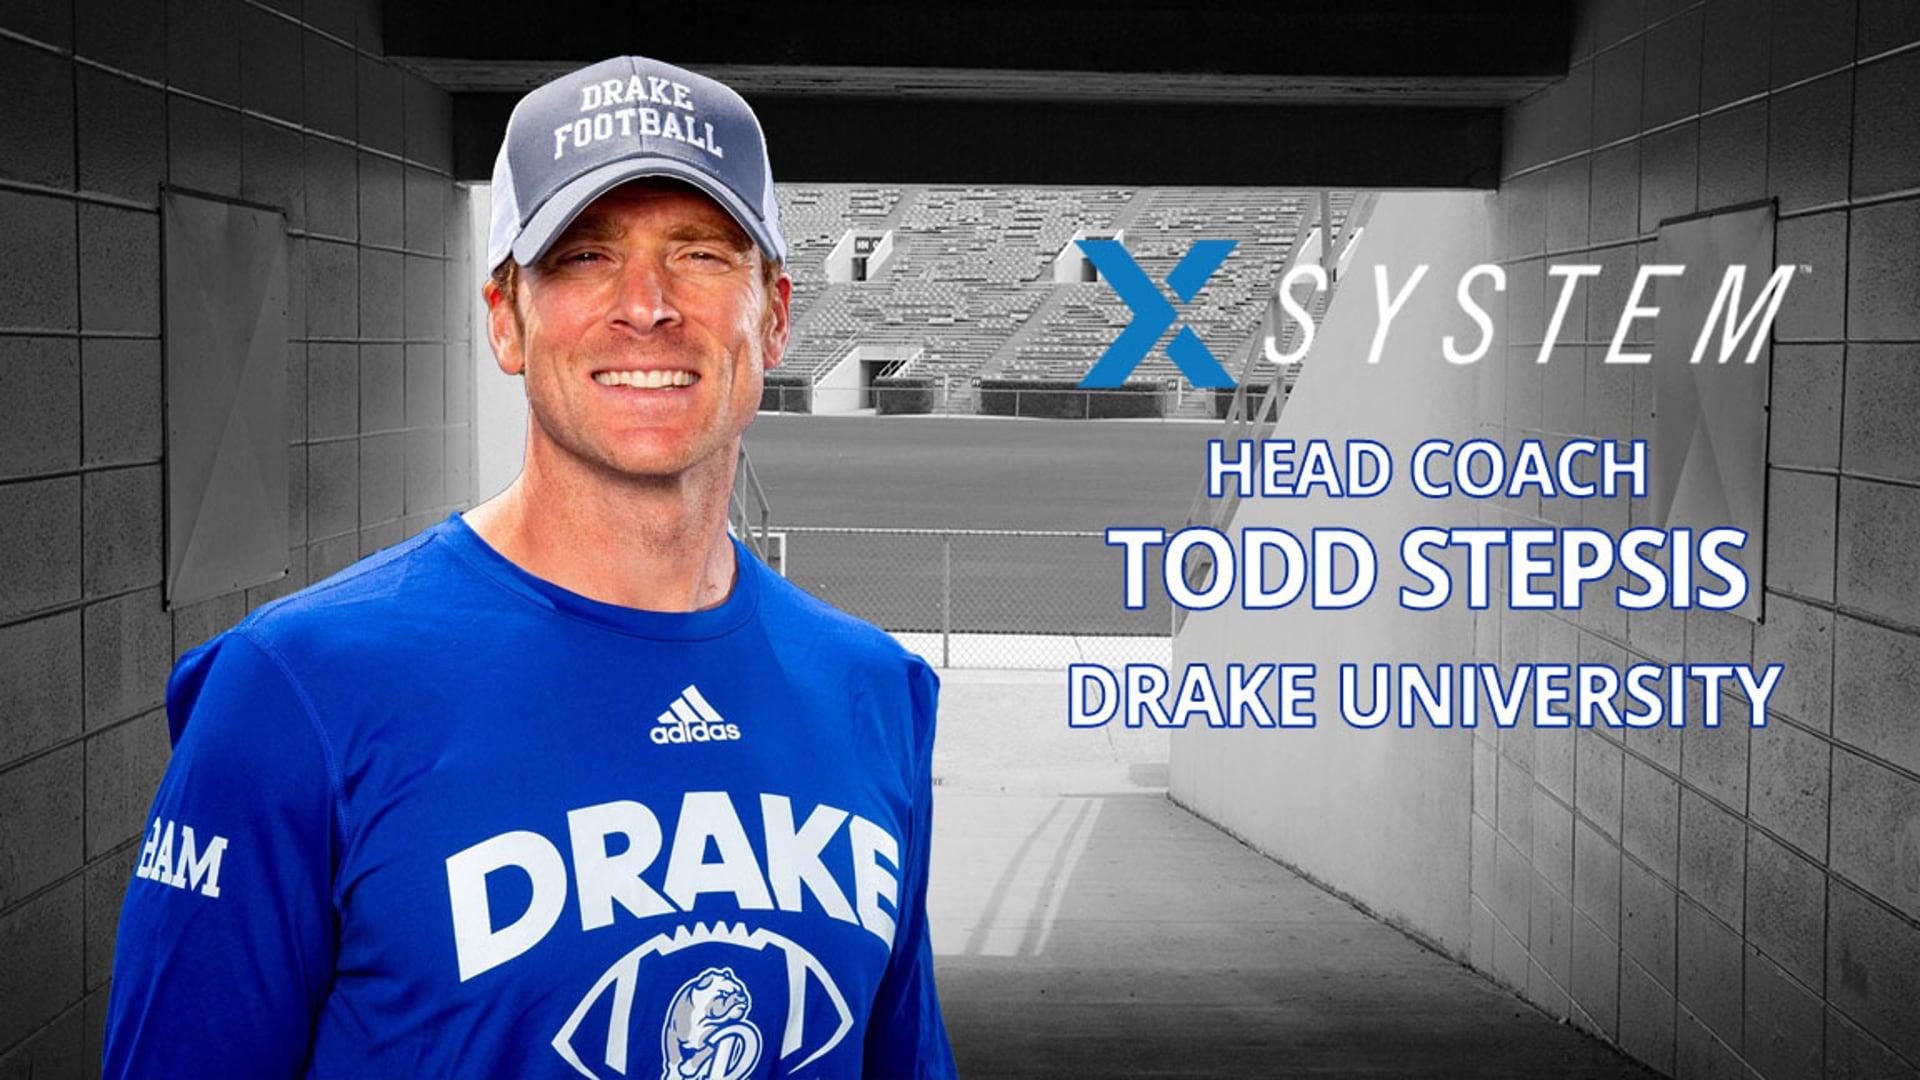 XSystem: Todd Stepsis, Drake University